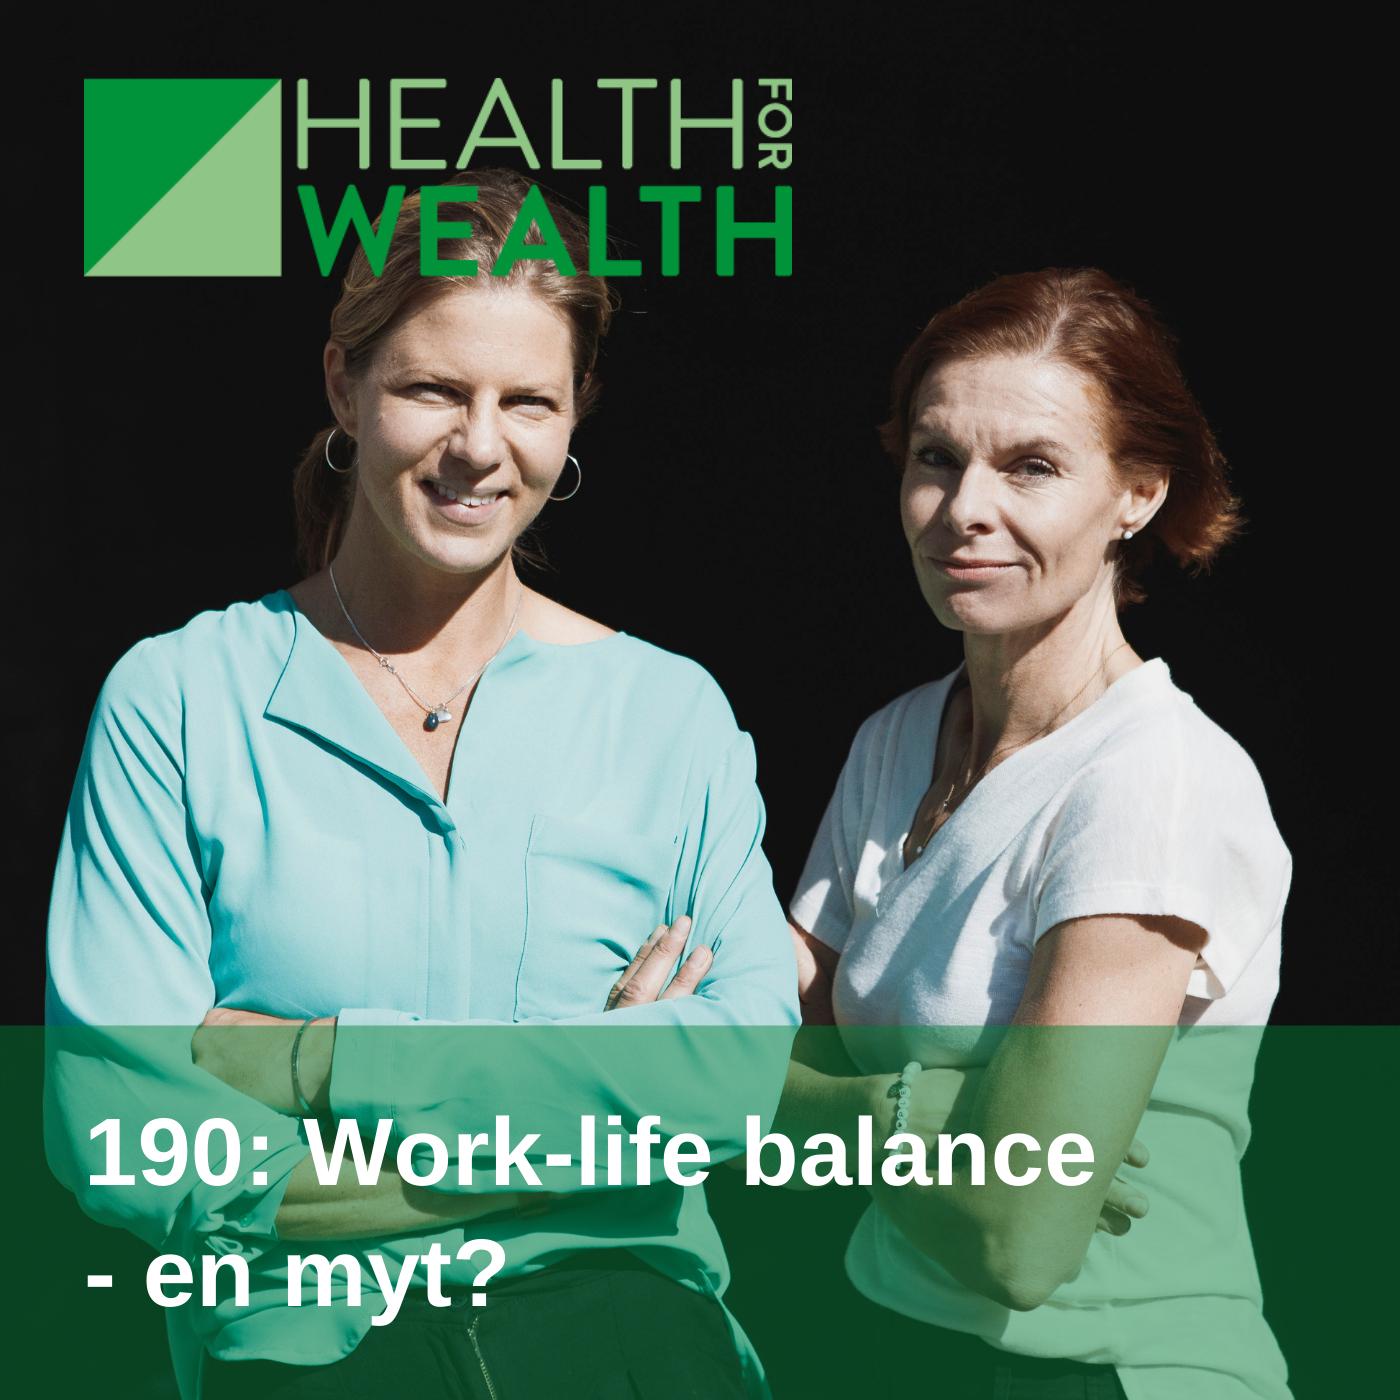 190: Work-life balance - en myt? (repris)